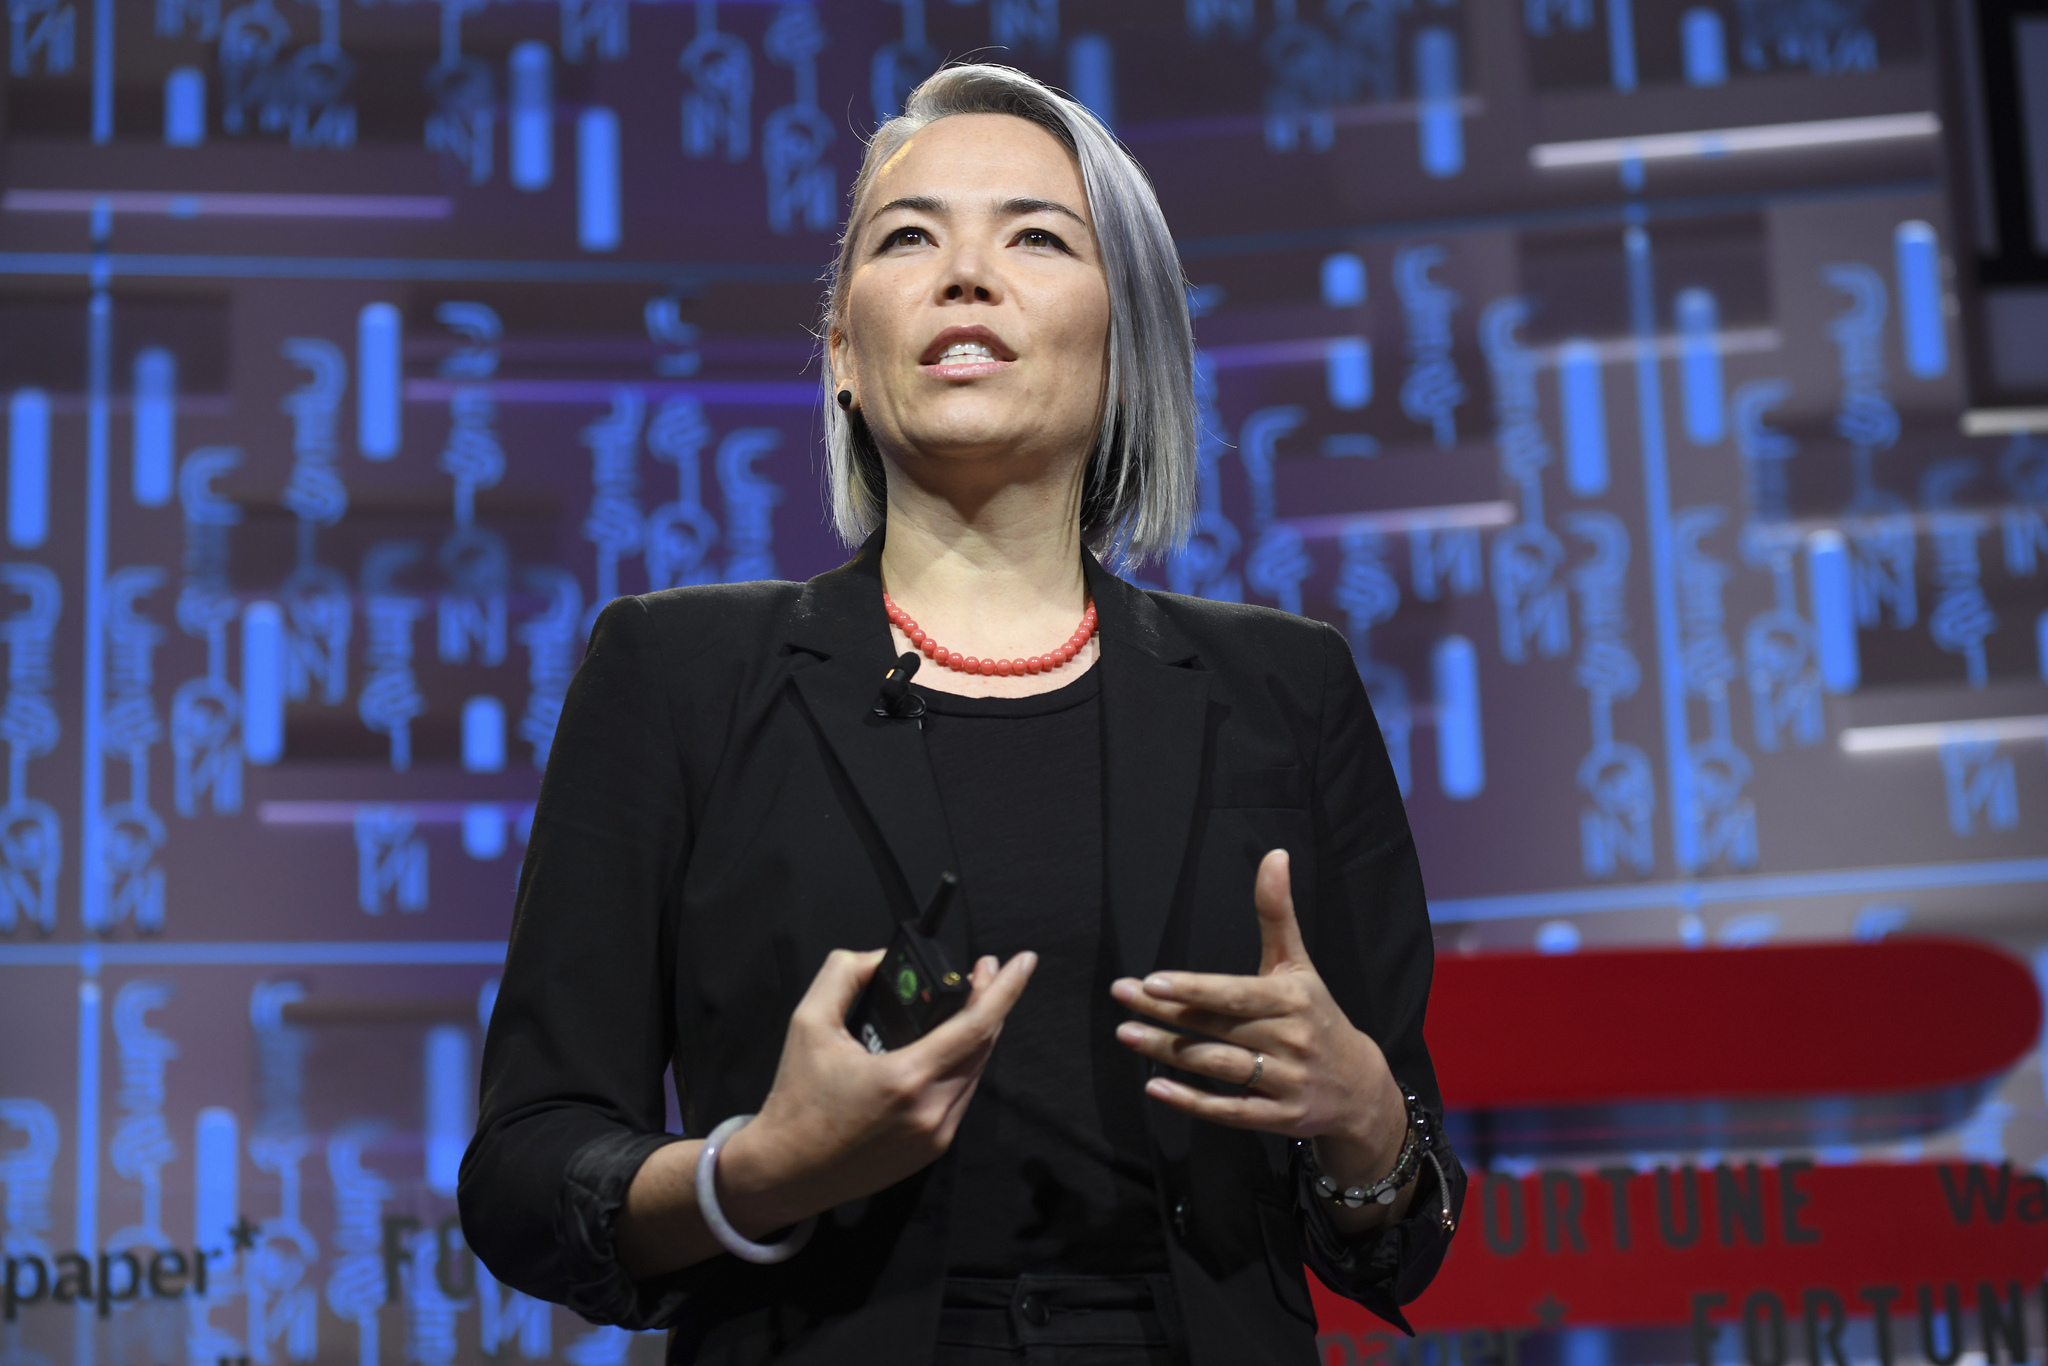 Google director of UX design Kat Holmes speaking at the 2019 Fortune Brainstorm Design conference in Singapore.